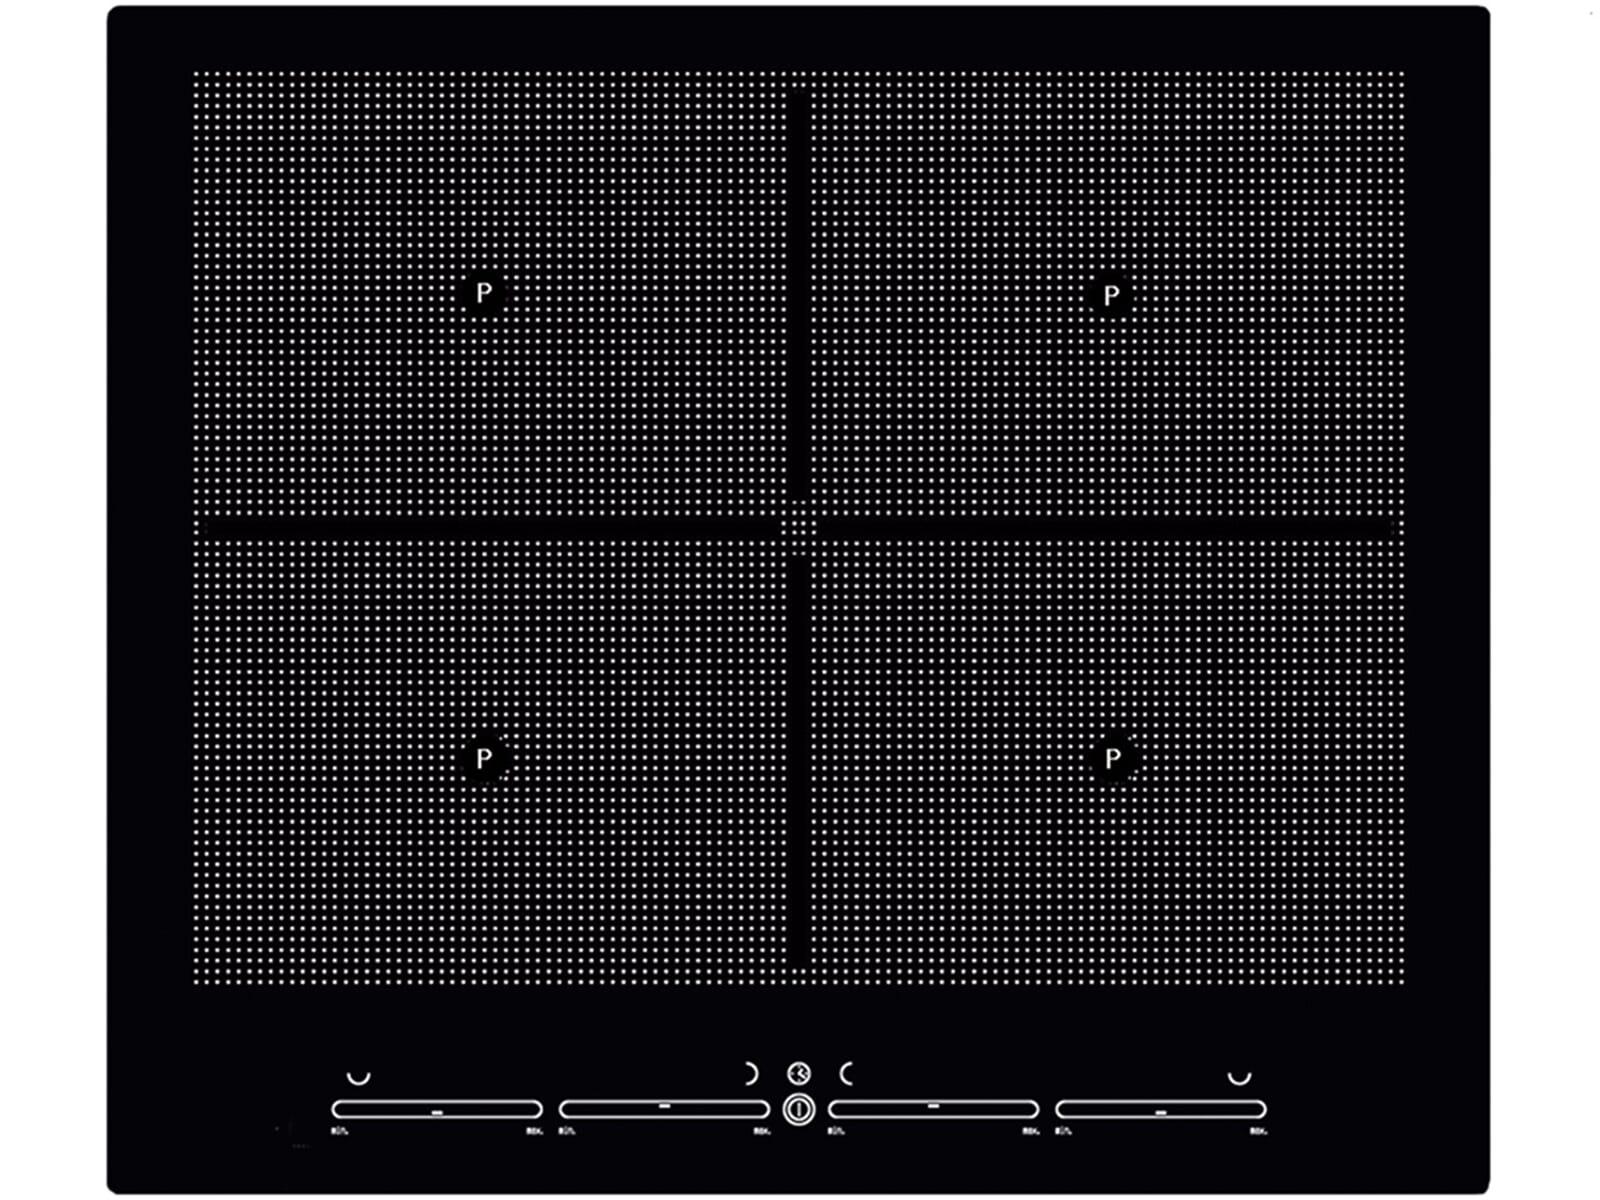 tk 60 i4 octa profi fb induktion herd glaskeramik kochfeld autark kochstelle ebay. Black Bedroom Furniture Sets. Home Design Ideas